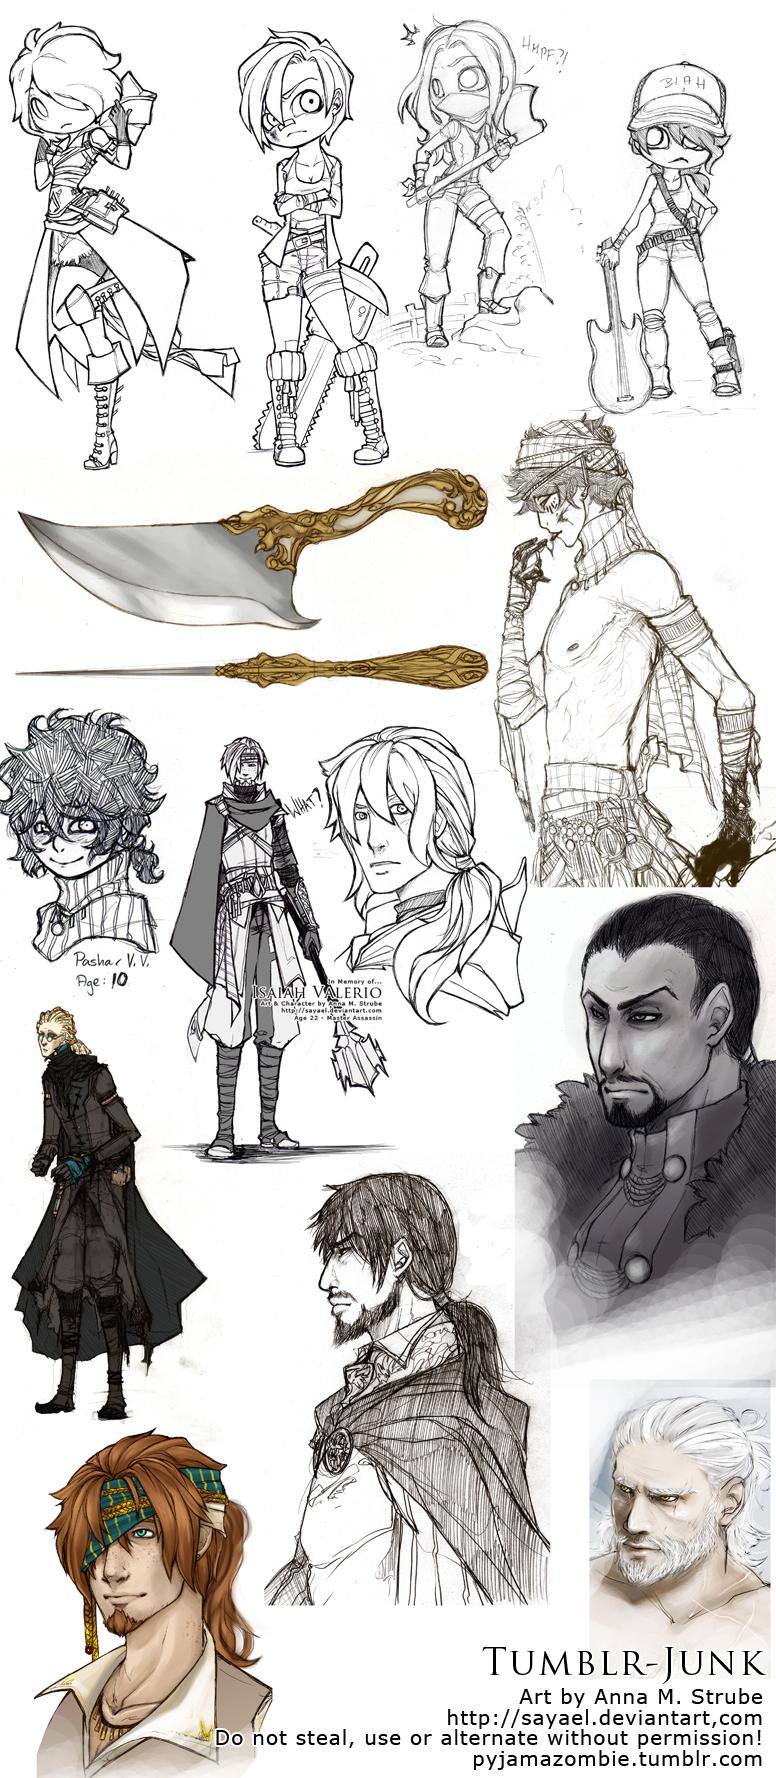 Random - Tumblr sketch dump by Sayael